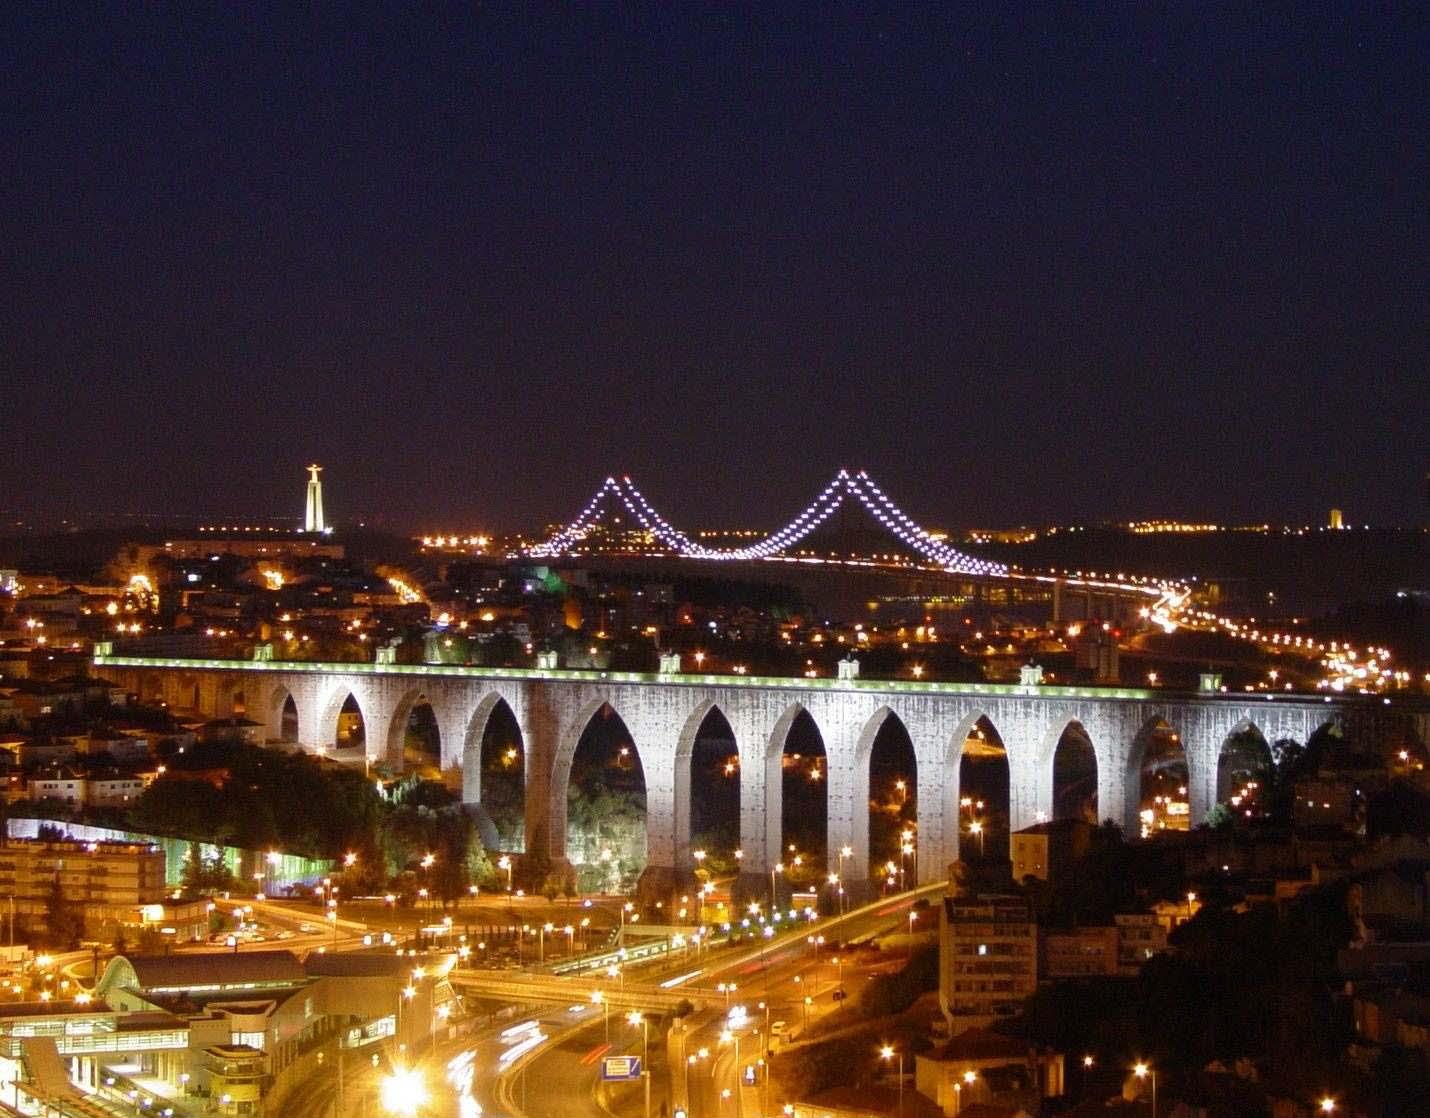 Lisboa, Portugal - Europe Photo (539903) - Fanpop